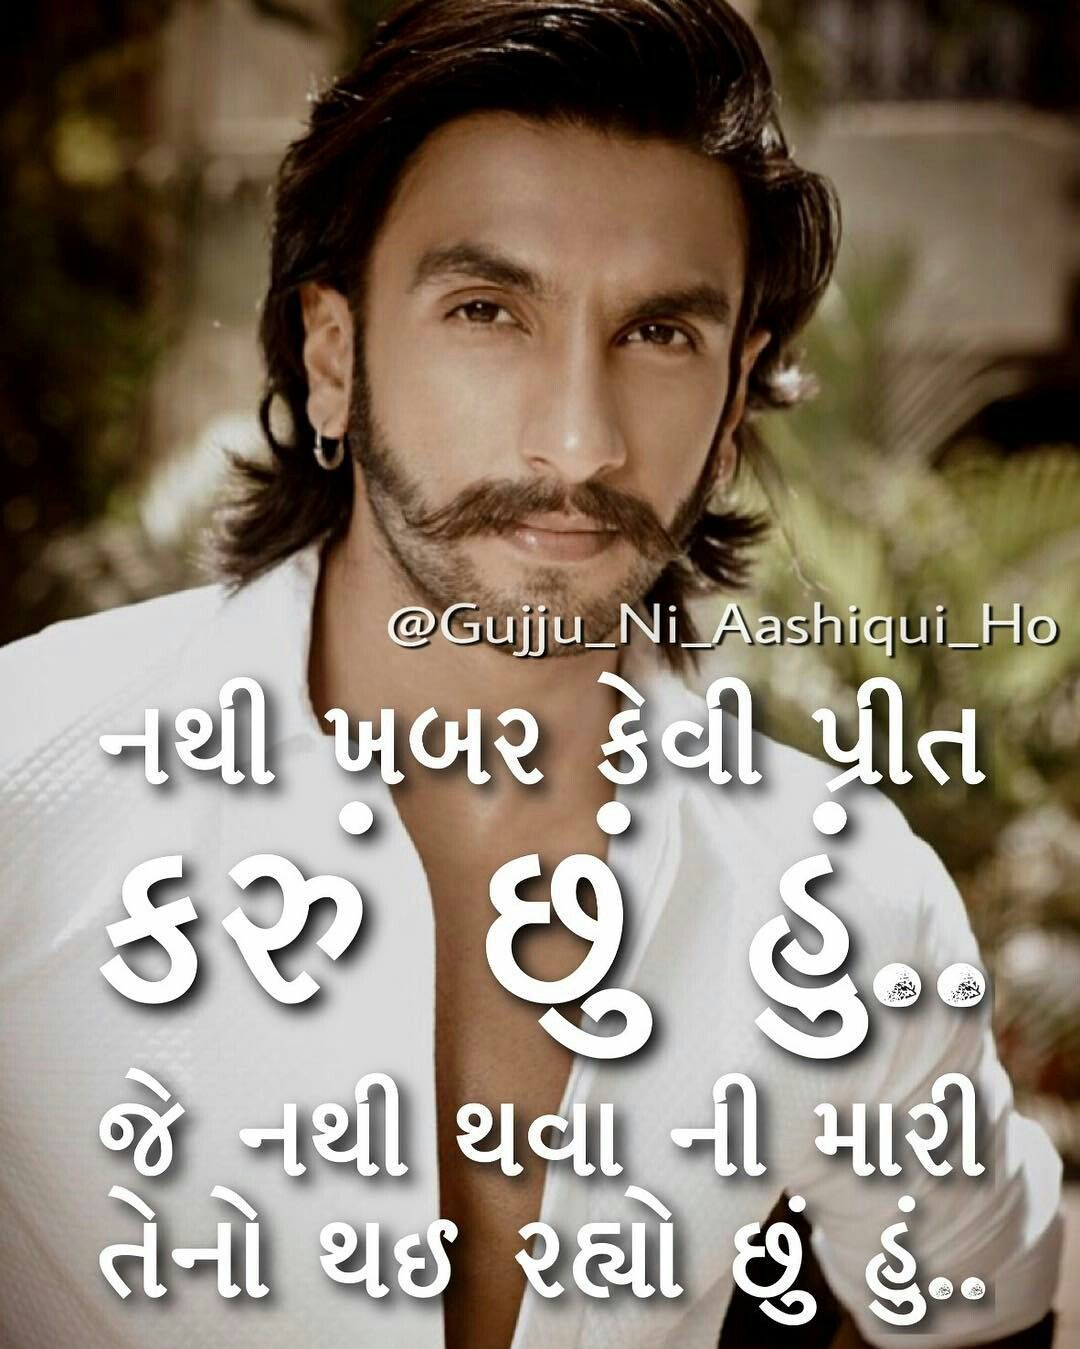 Pin by Prakash on Gujarati... (With images) Gujarati